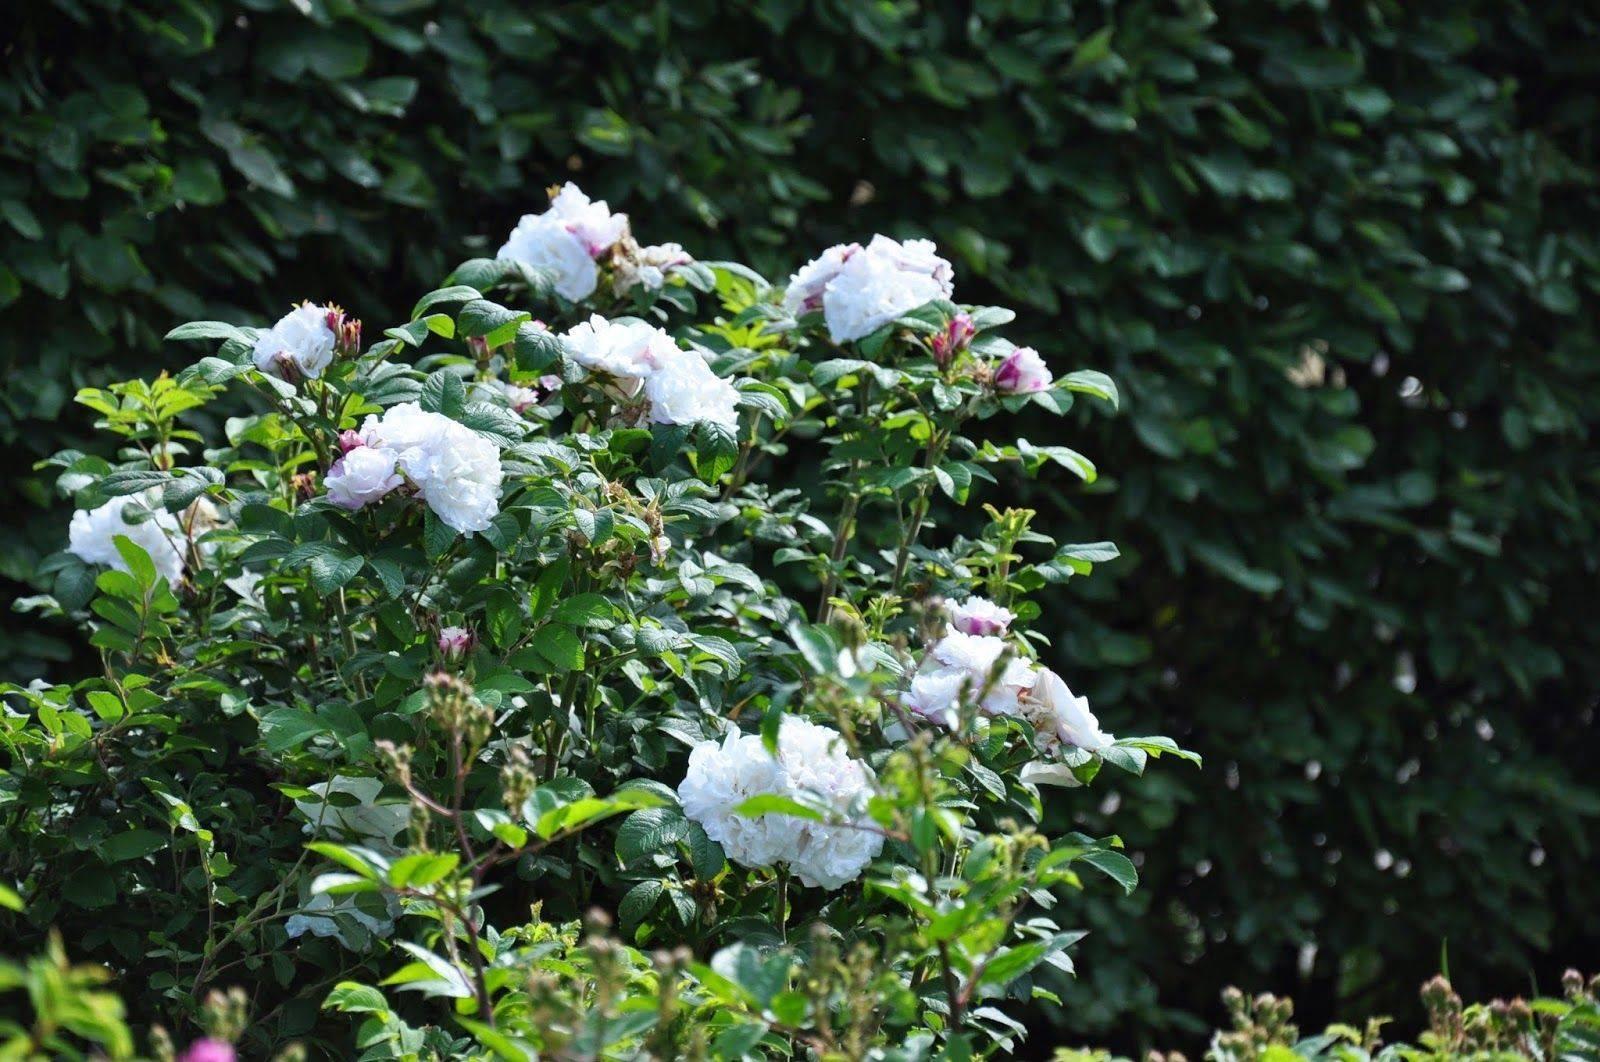 Посадка и уход за канадской парковой розой луиза багнет: агротехника